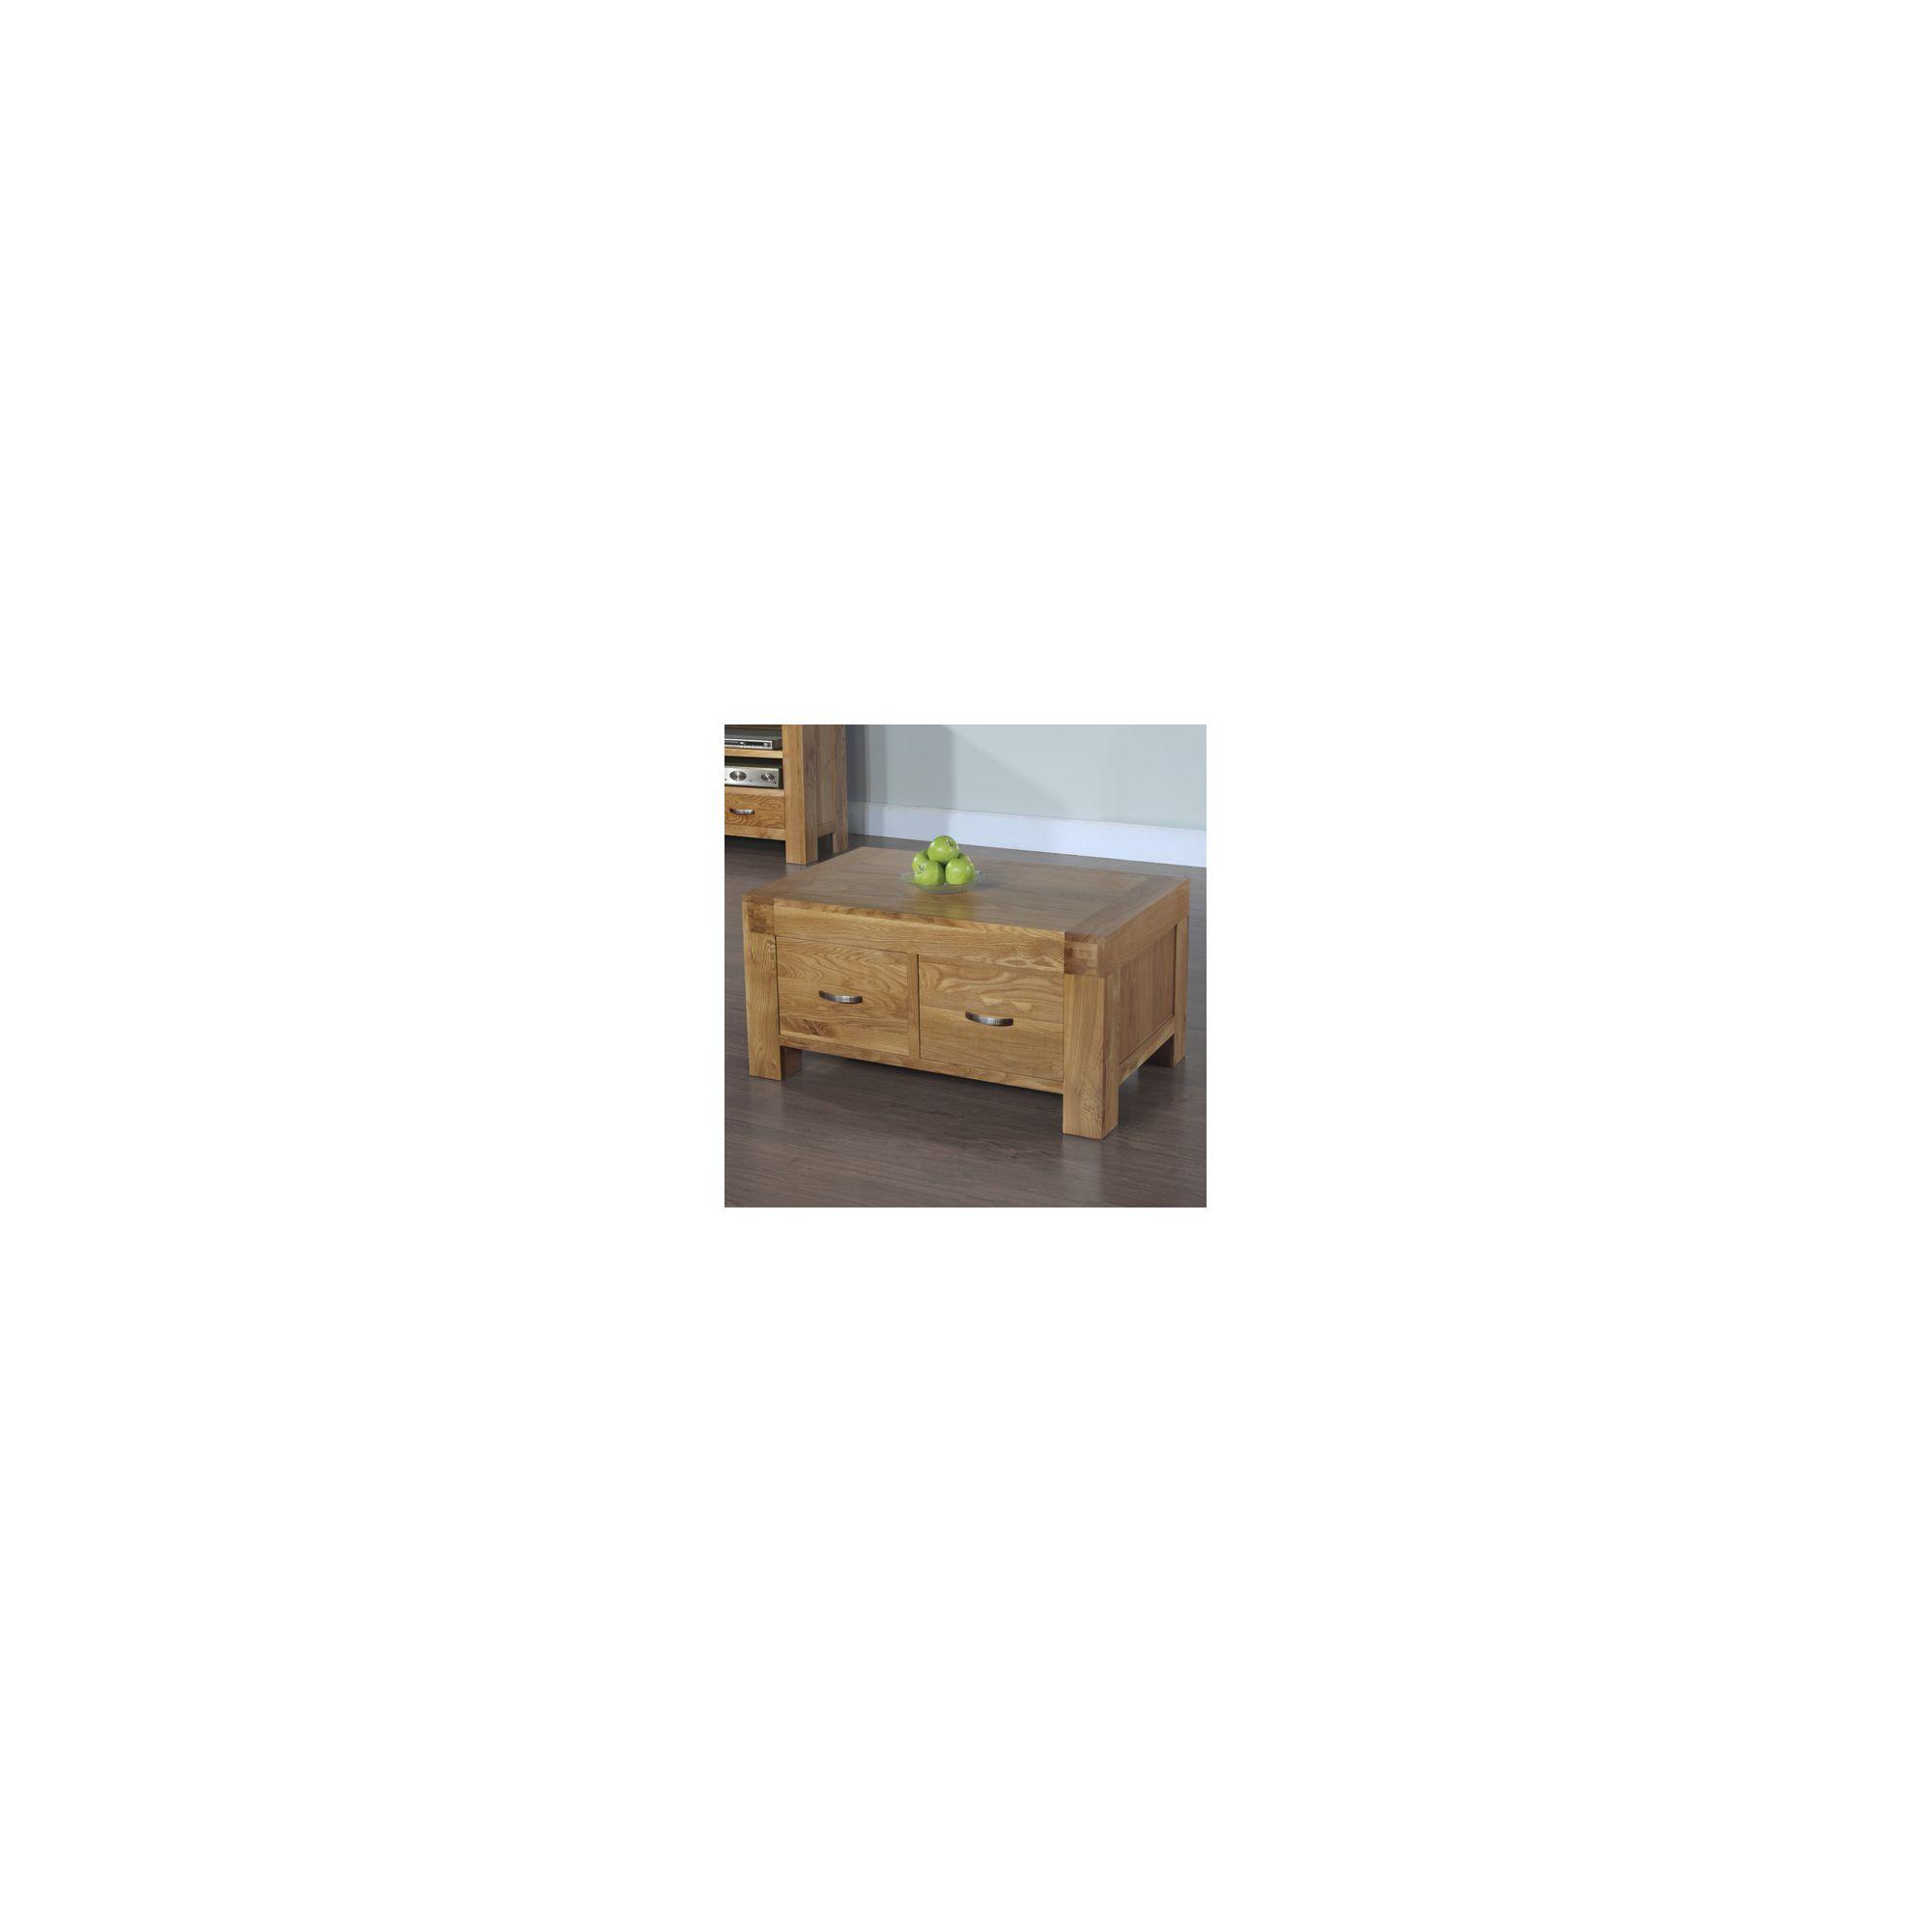 Hawkshead Rustic Oak Blonde 2 Drawer Coffee Table at Tesco Direct